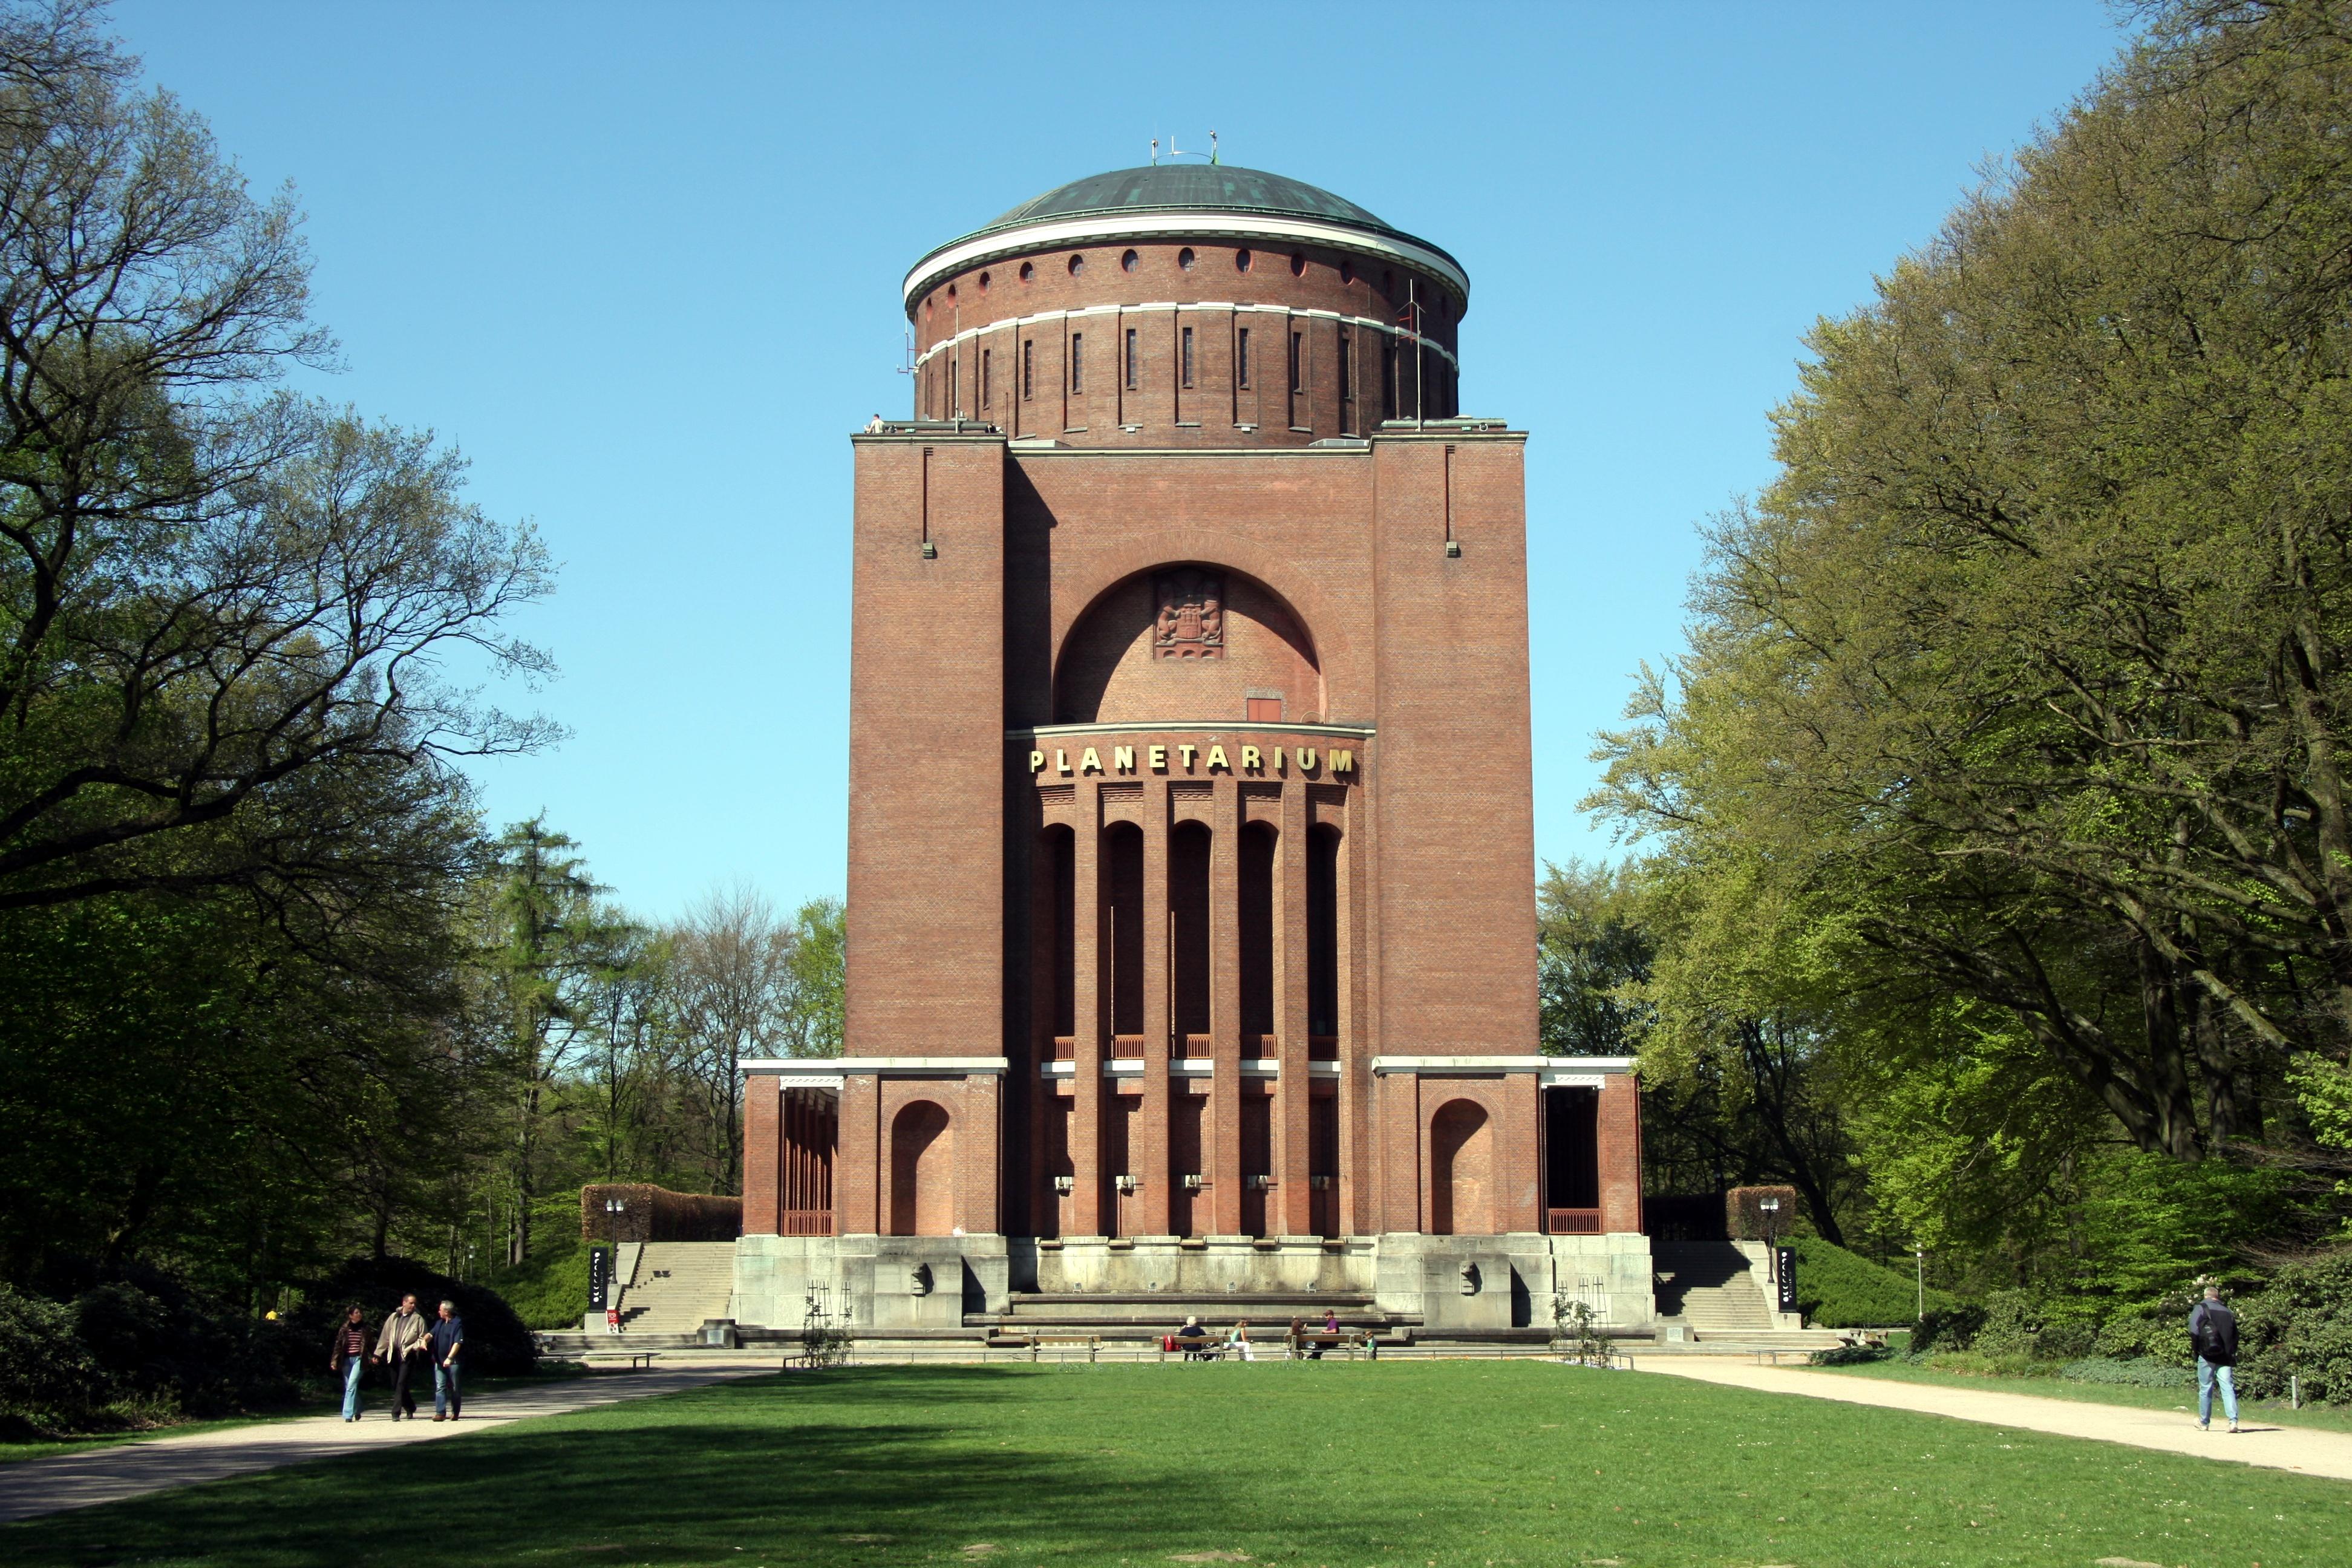 File:Planetarium Hamburg.JPG - Wikimedia Commons  File:Planetariu...